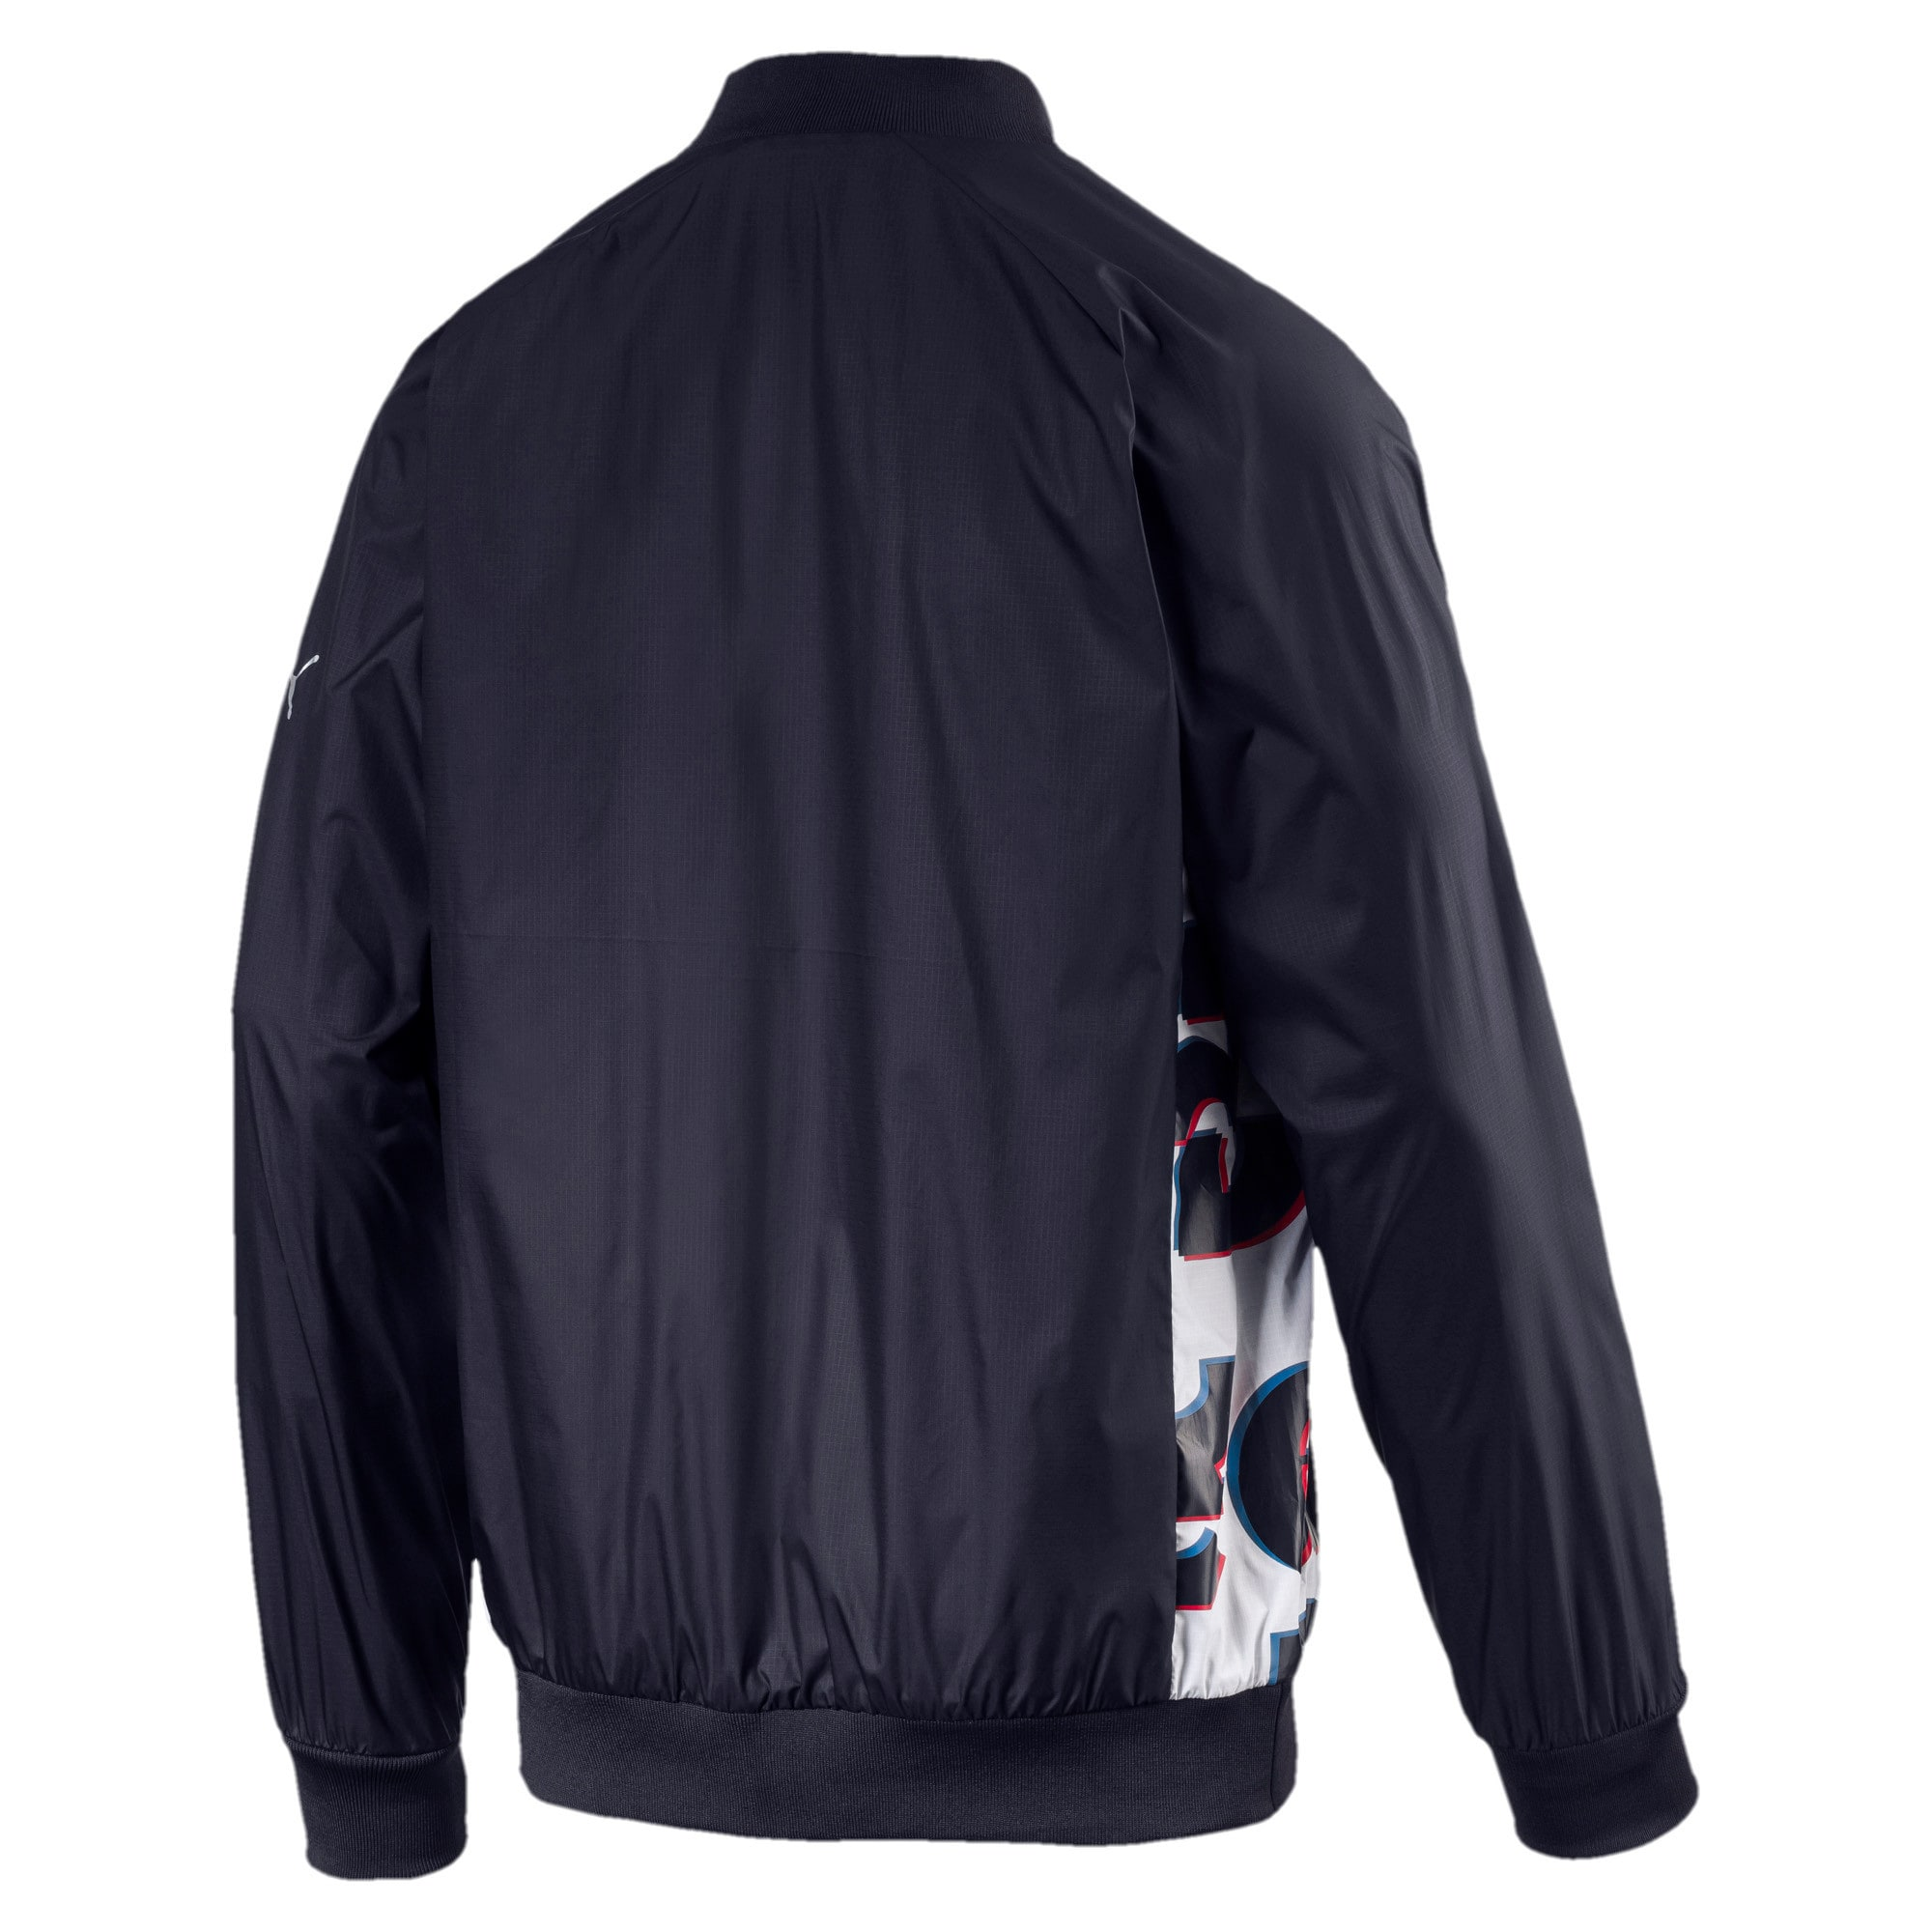 Thumbnail 3 of Red Bull Racing NightCat Men's Jacket, NIGHT SKY, medium-IND